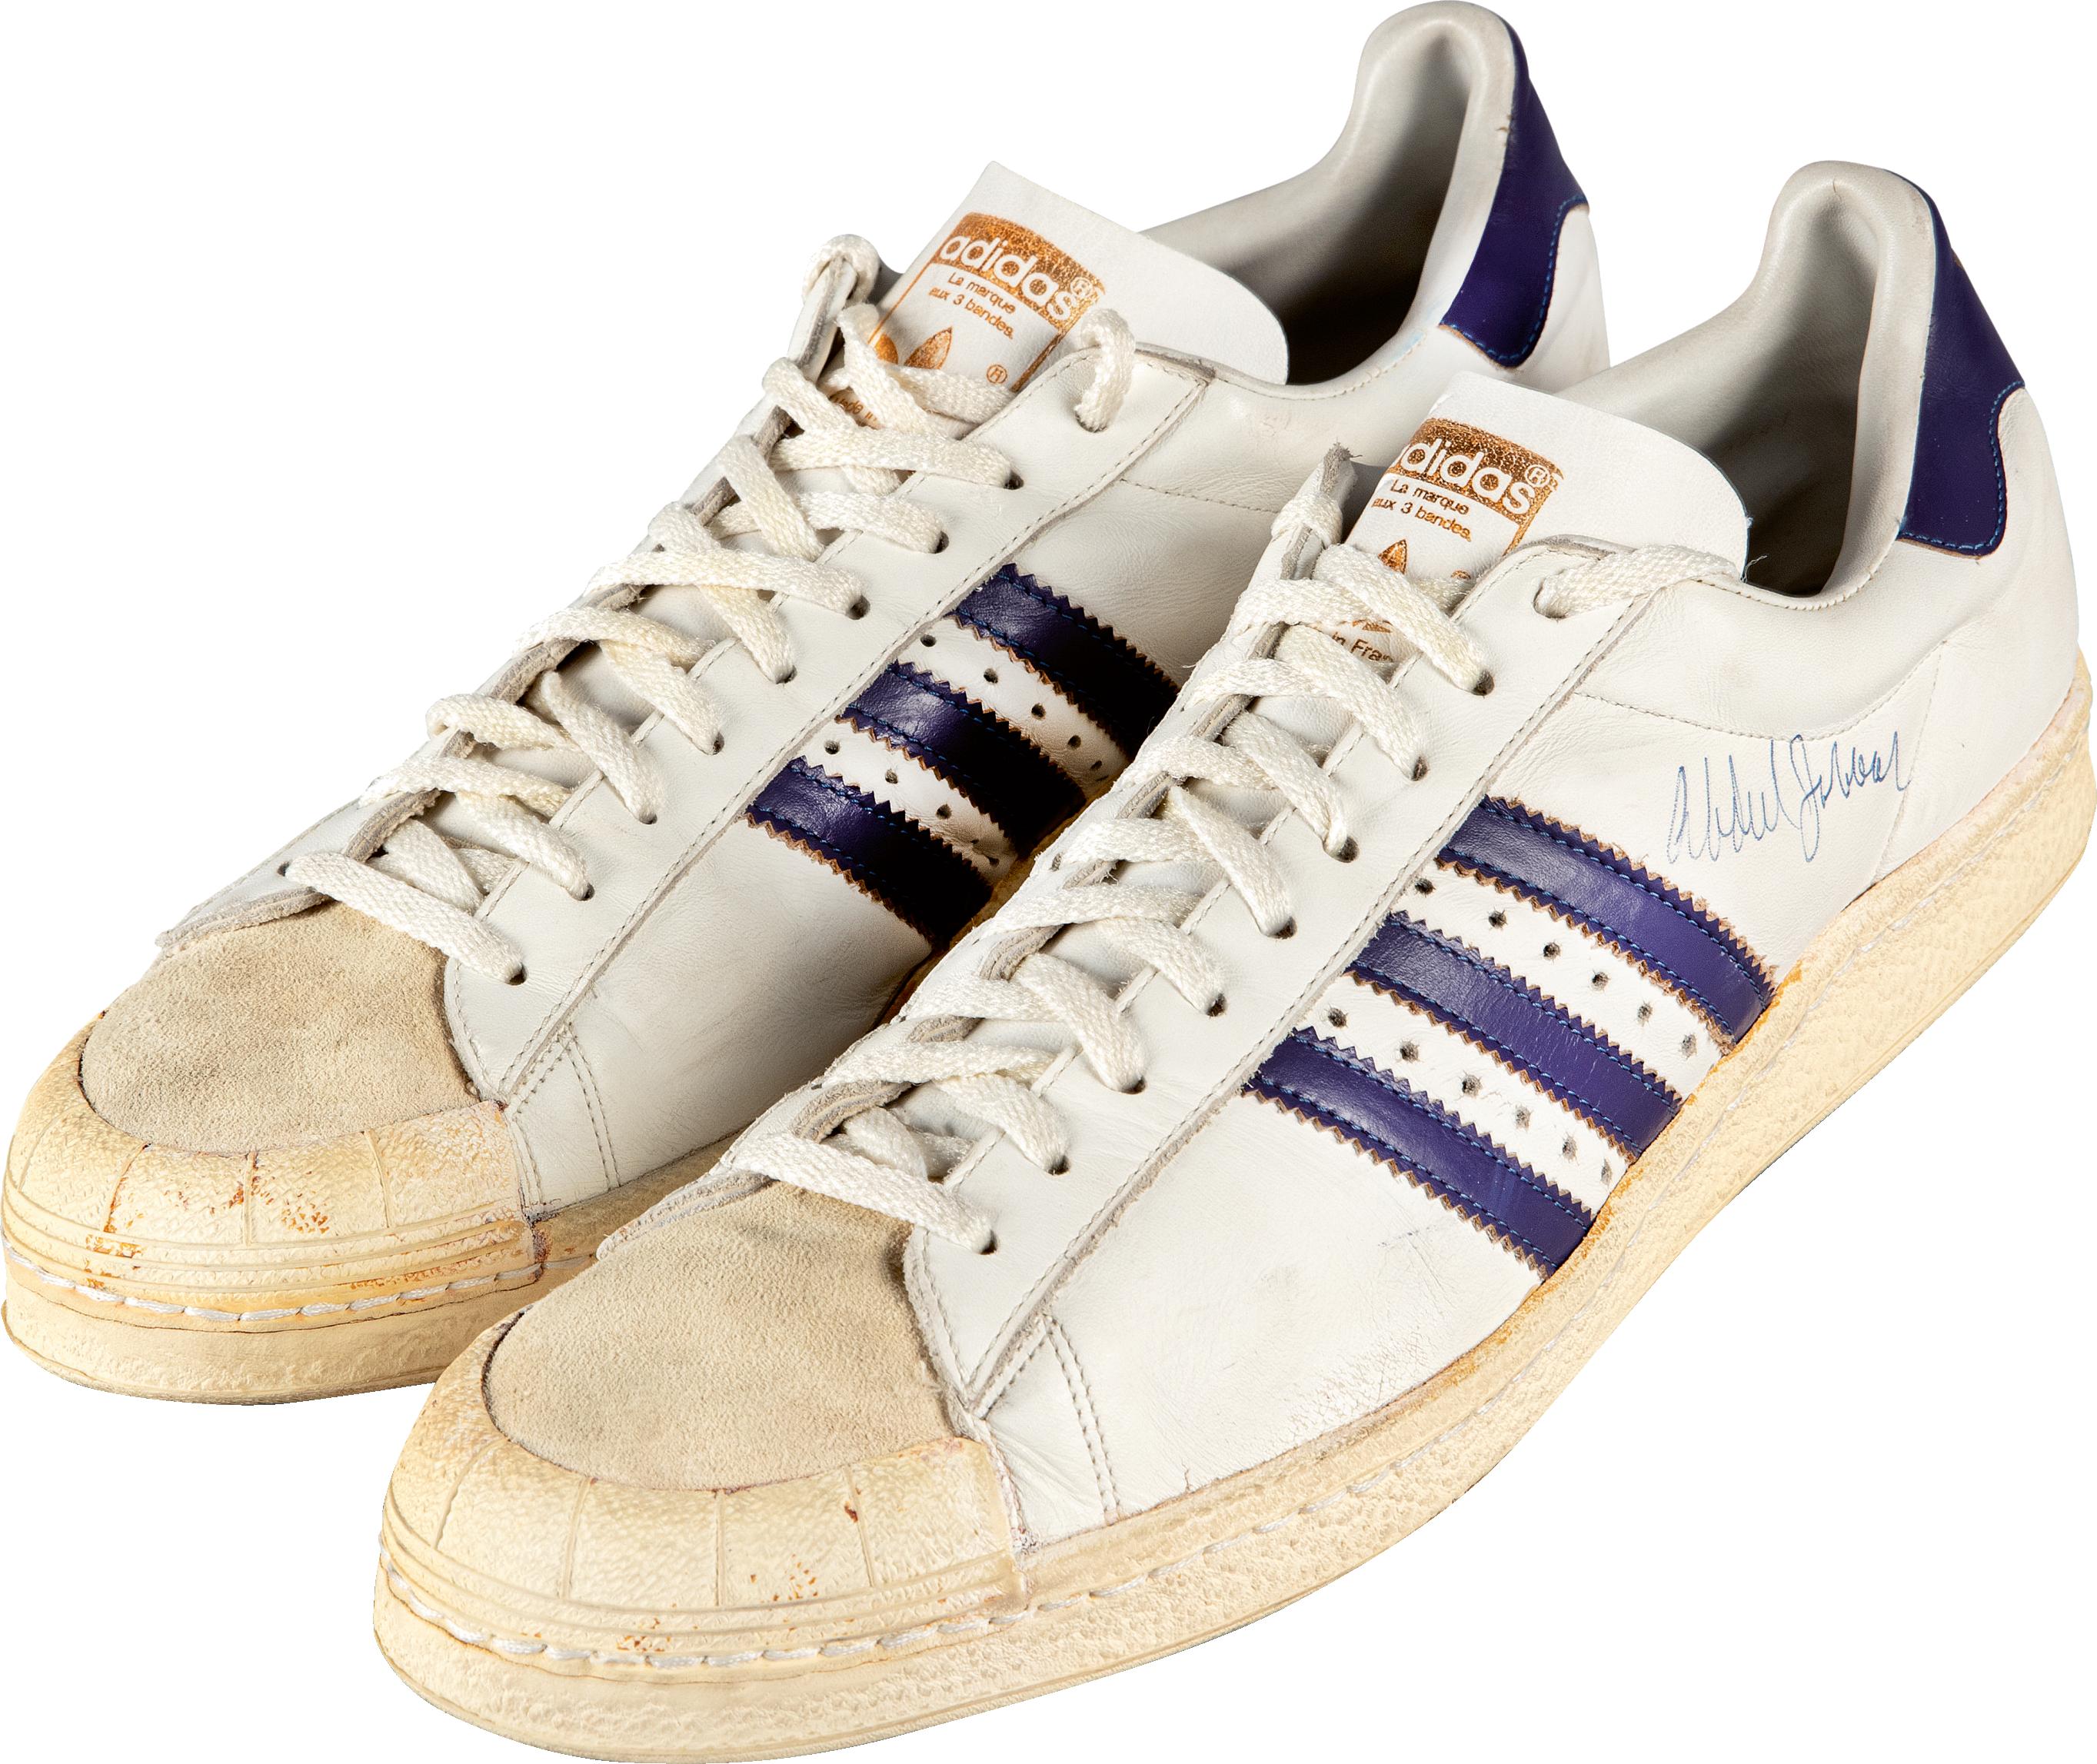 kareem-abdul-jabbar-adidas-dc90